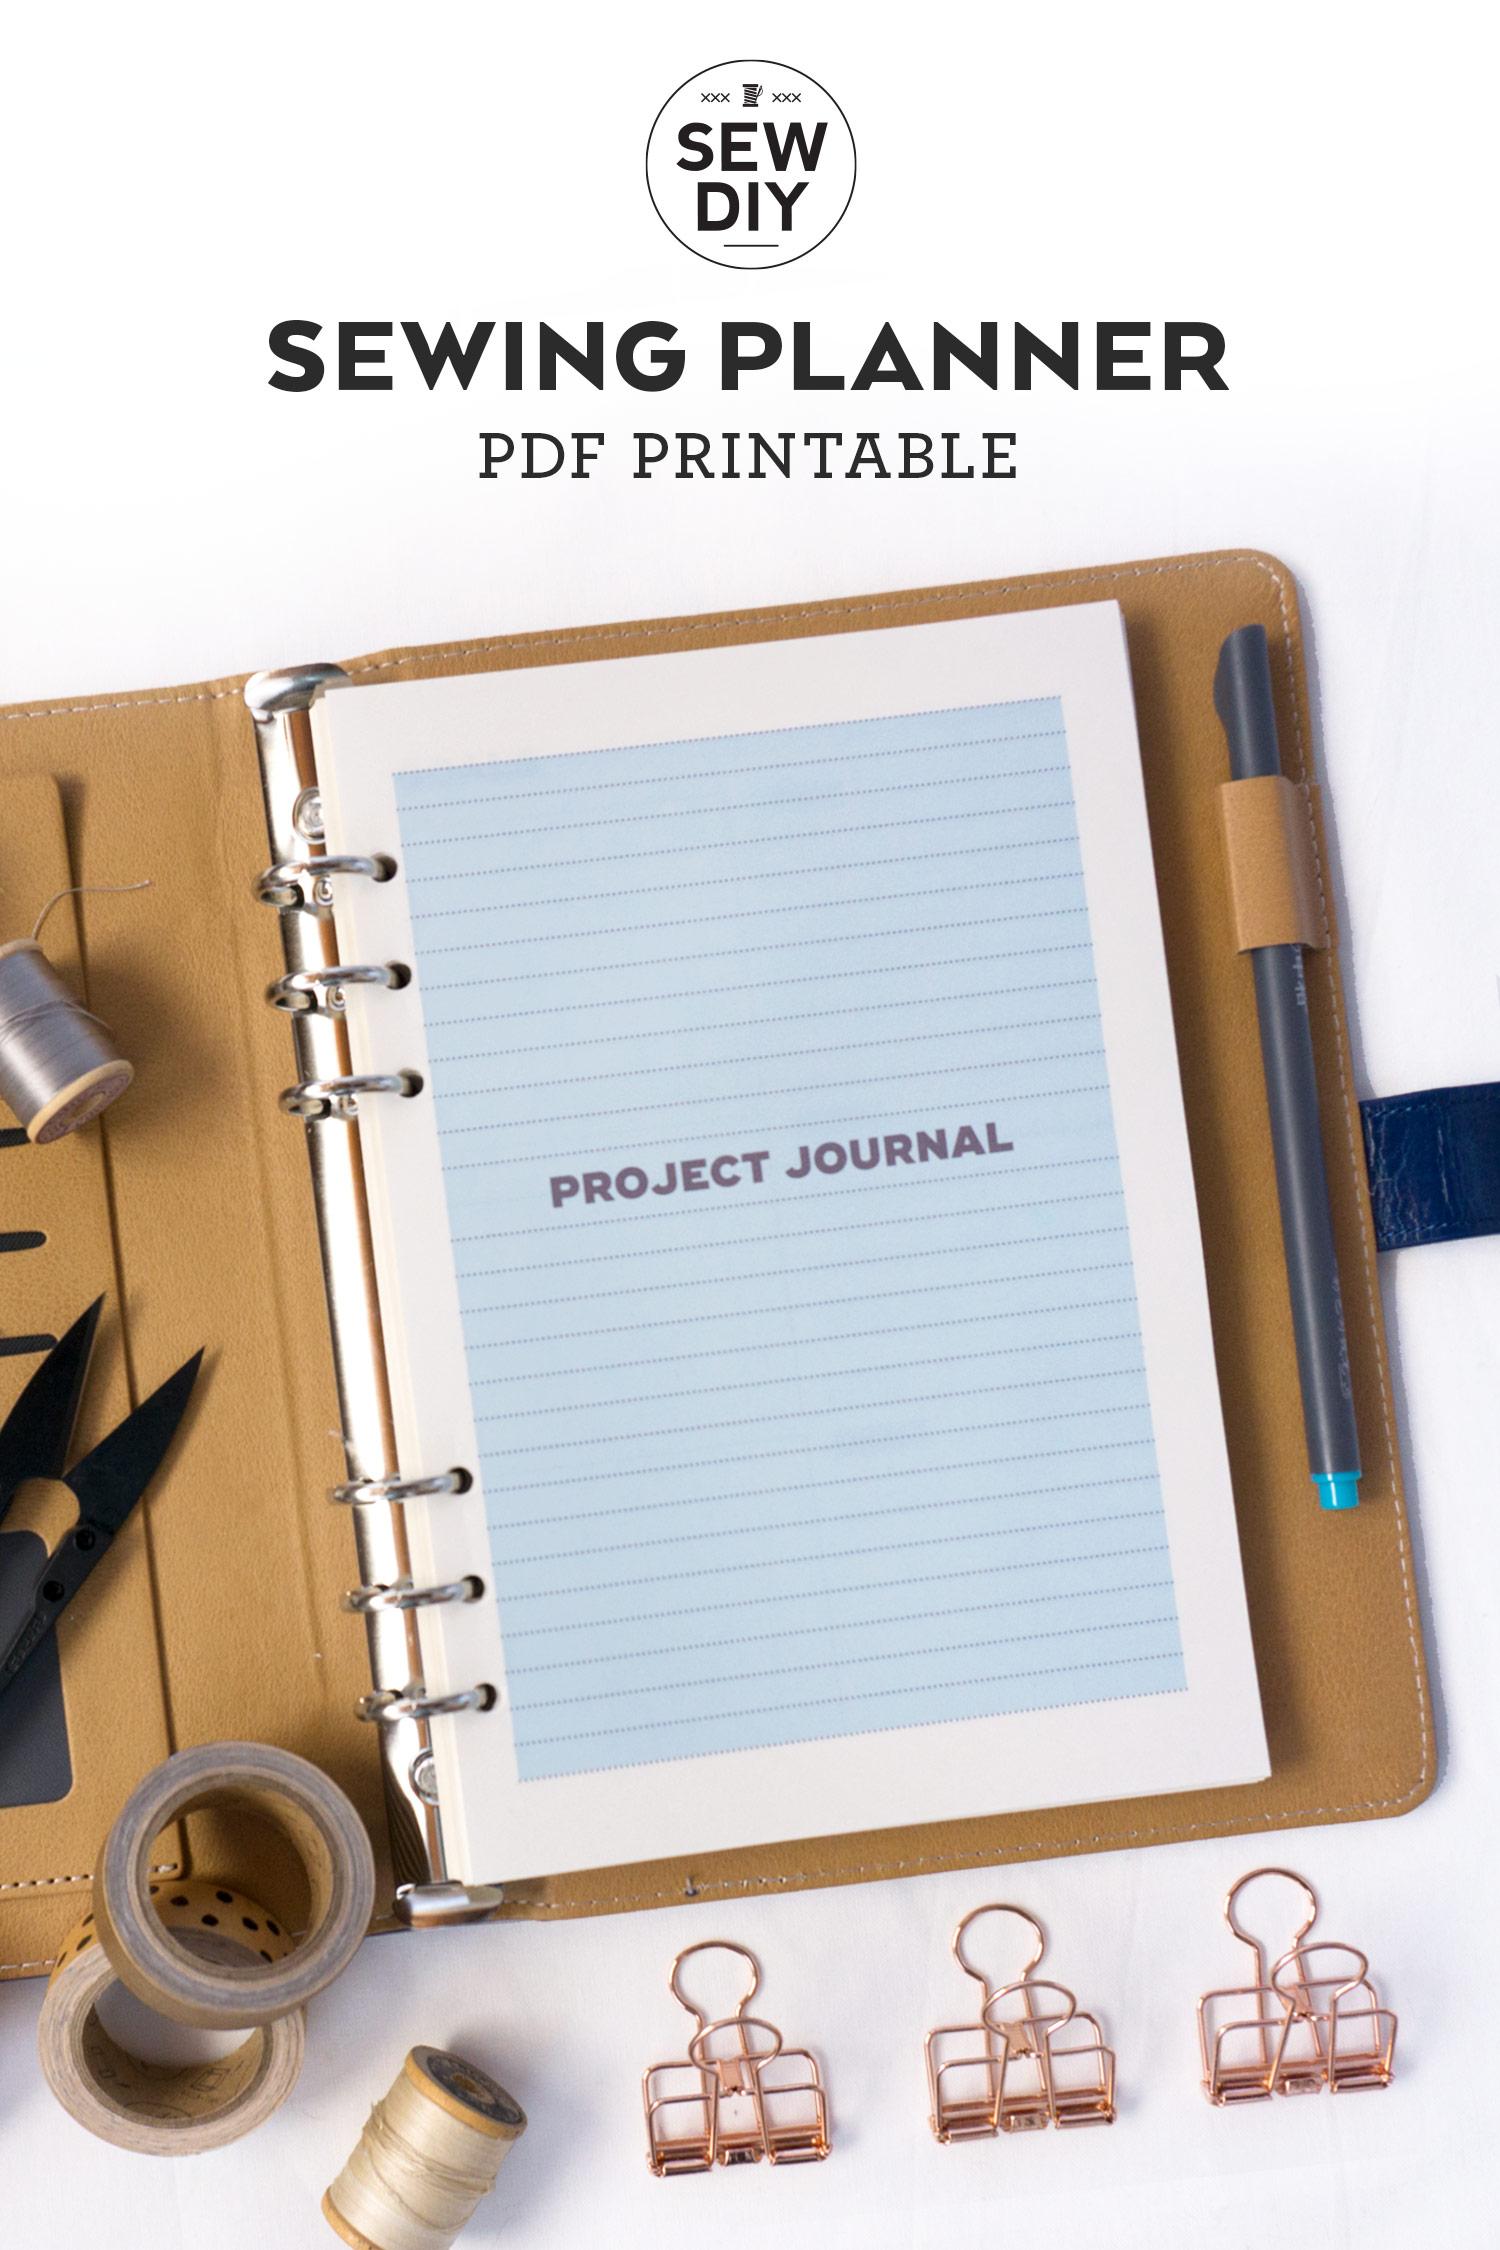 Introducing The Sew Diy Printable Sewing Planner Sew Diy